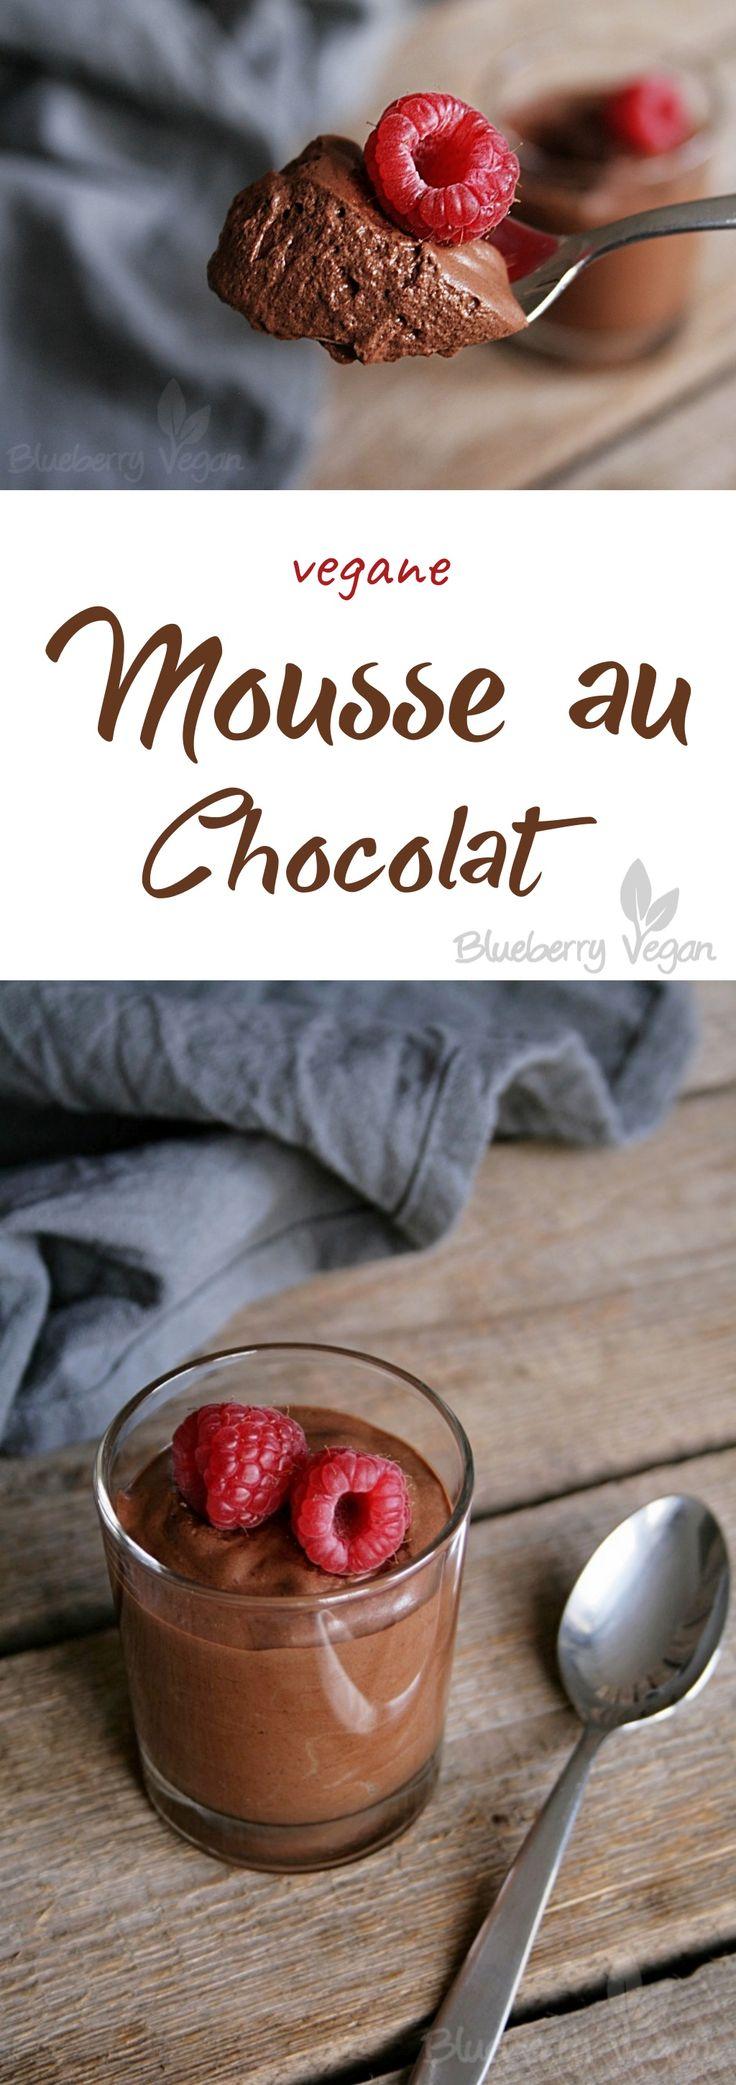 Mousse au Chocolat – EASY VEGAN MEALS